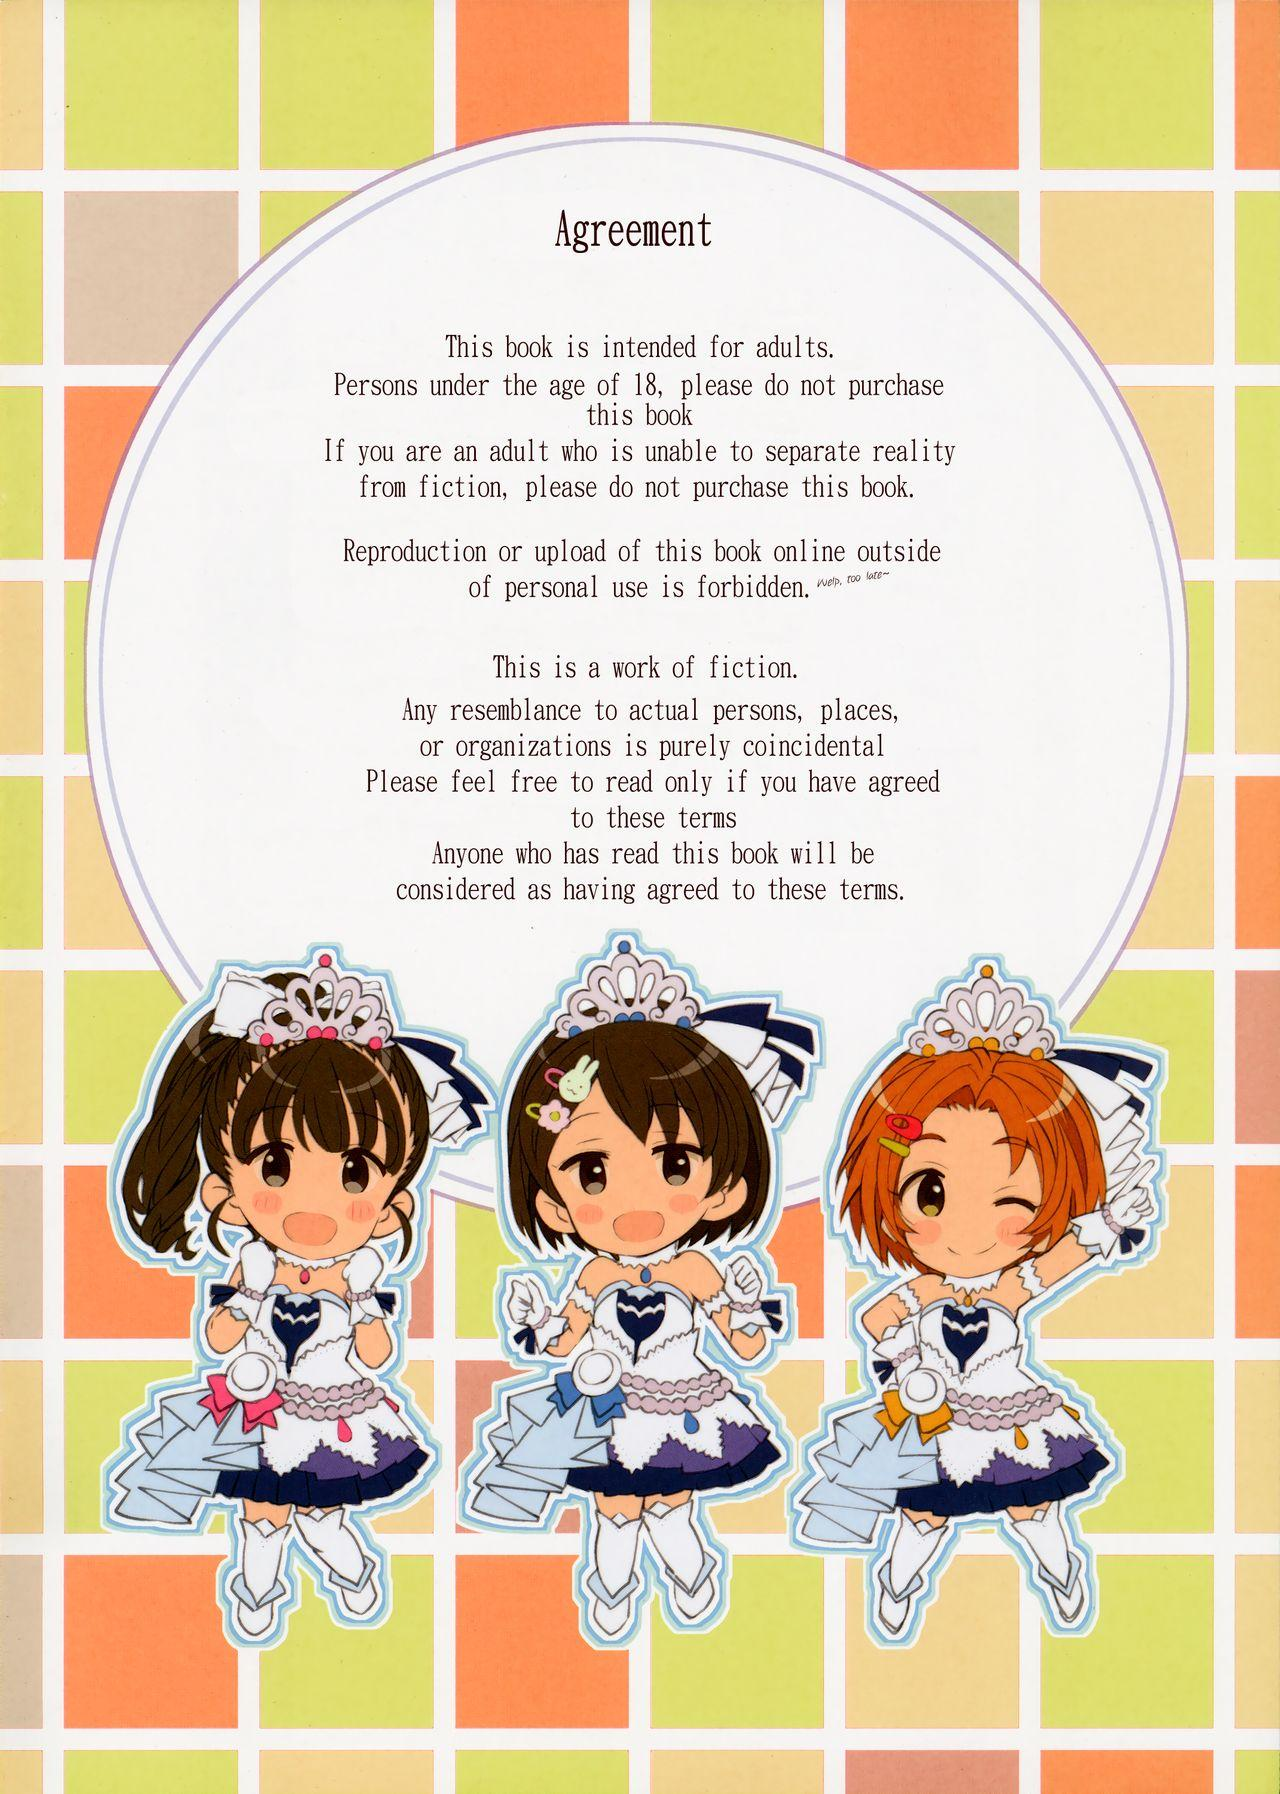 9-byou goto ni Koukakuritsu de Kanari no Aida, Lolicon ga Hasshou suru   Every 9 seconds, there is a high chance to contract lolicon for a period of time 1